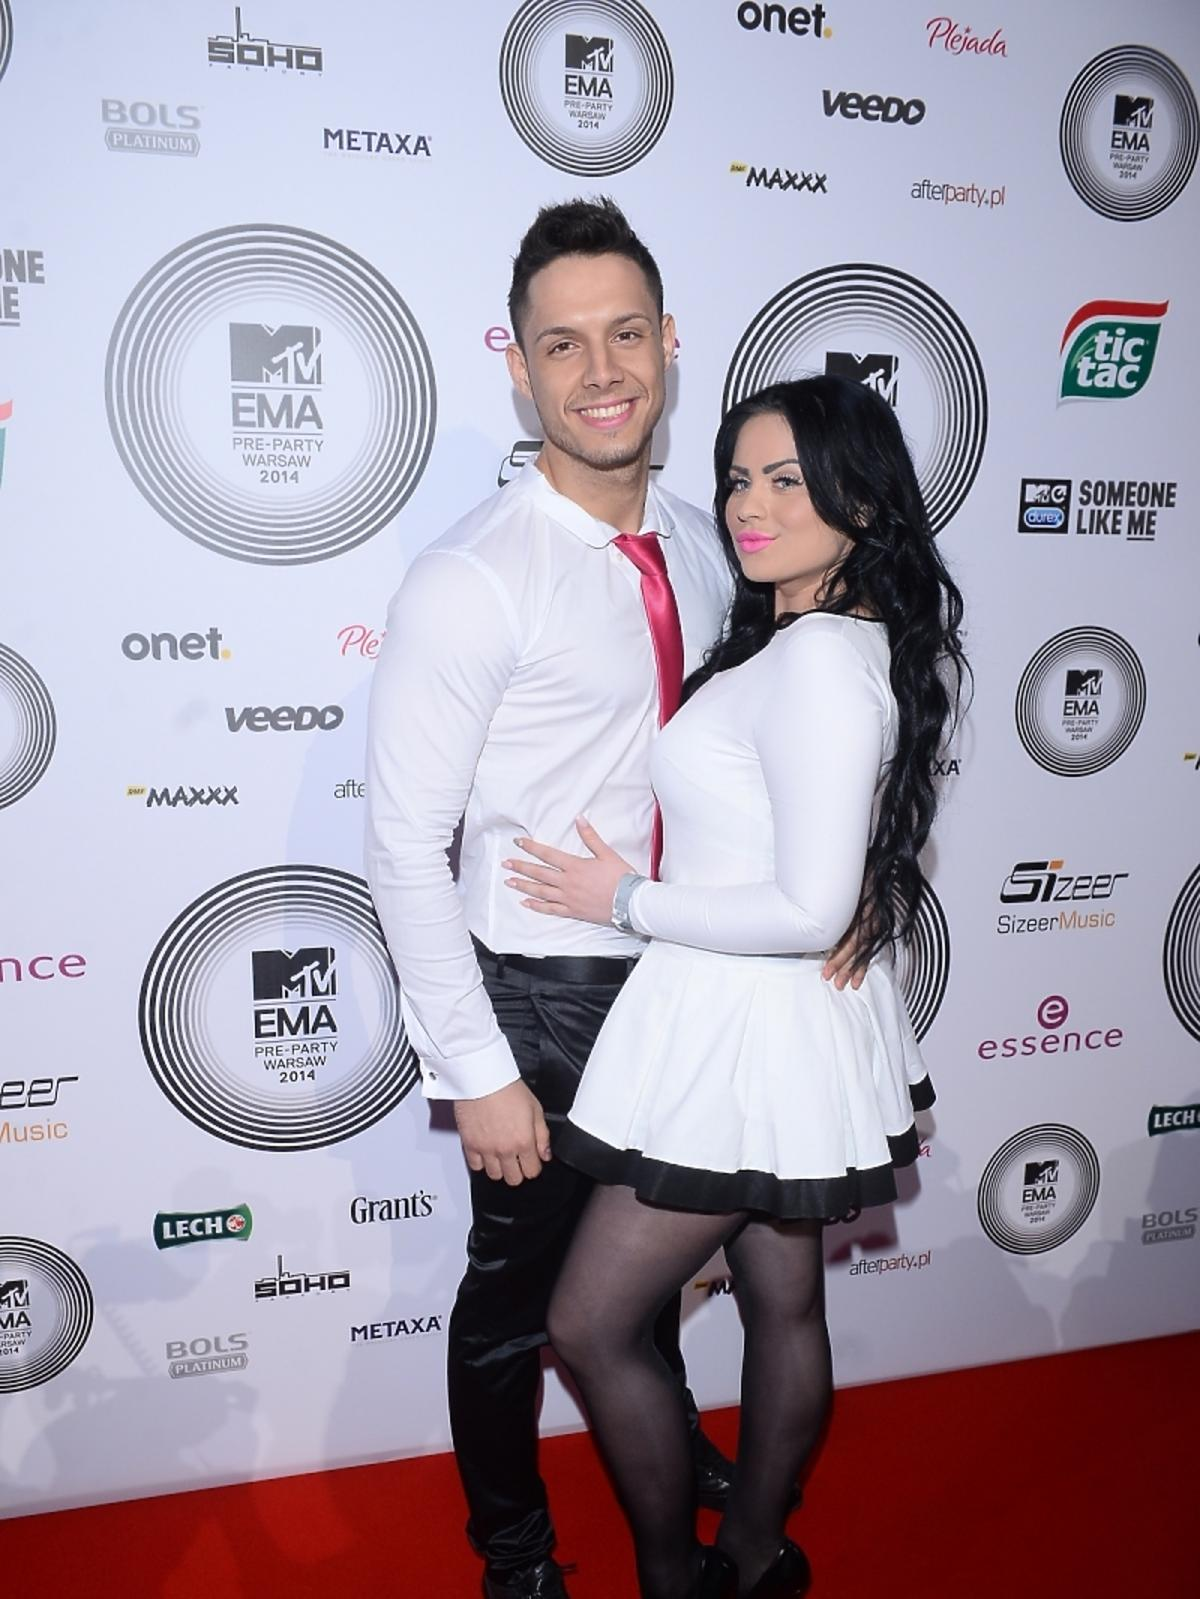 Ewelina i Paweł z Warsaw Shore na MTV EMA Pre-Party 2014